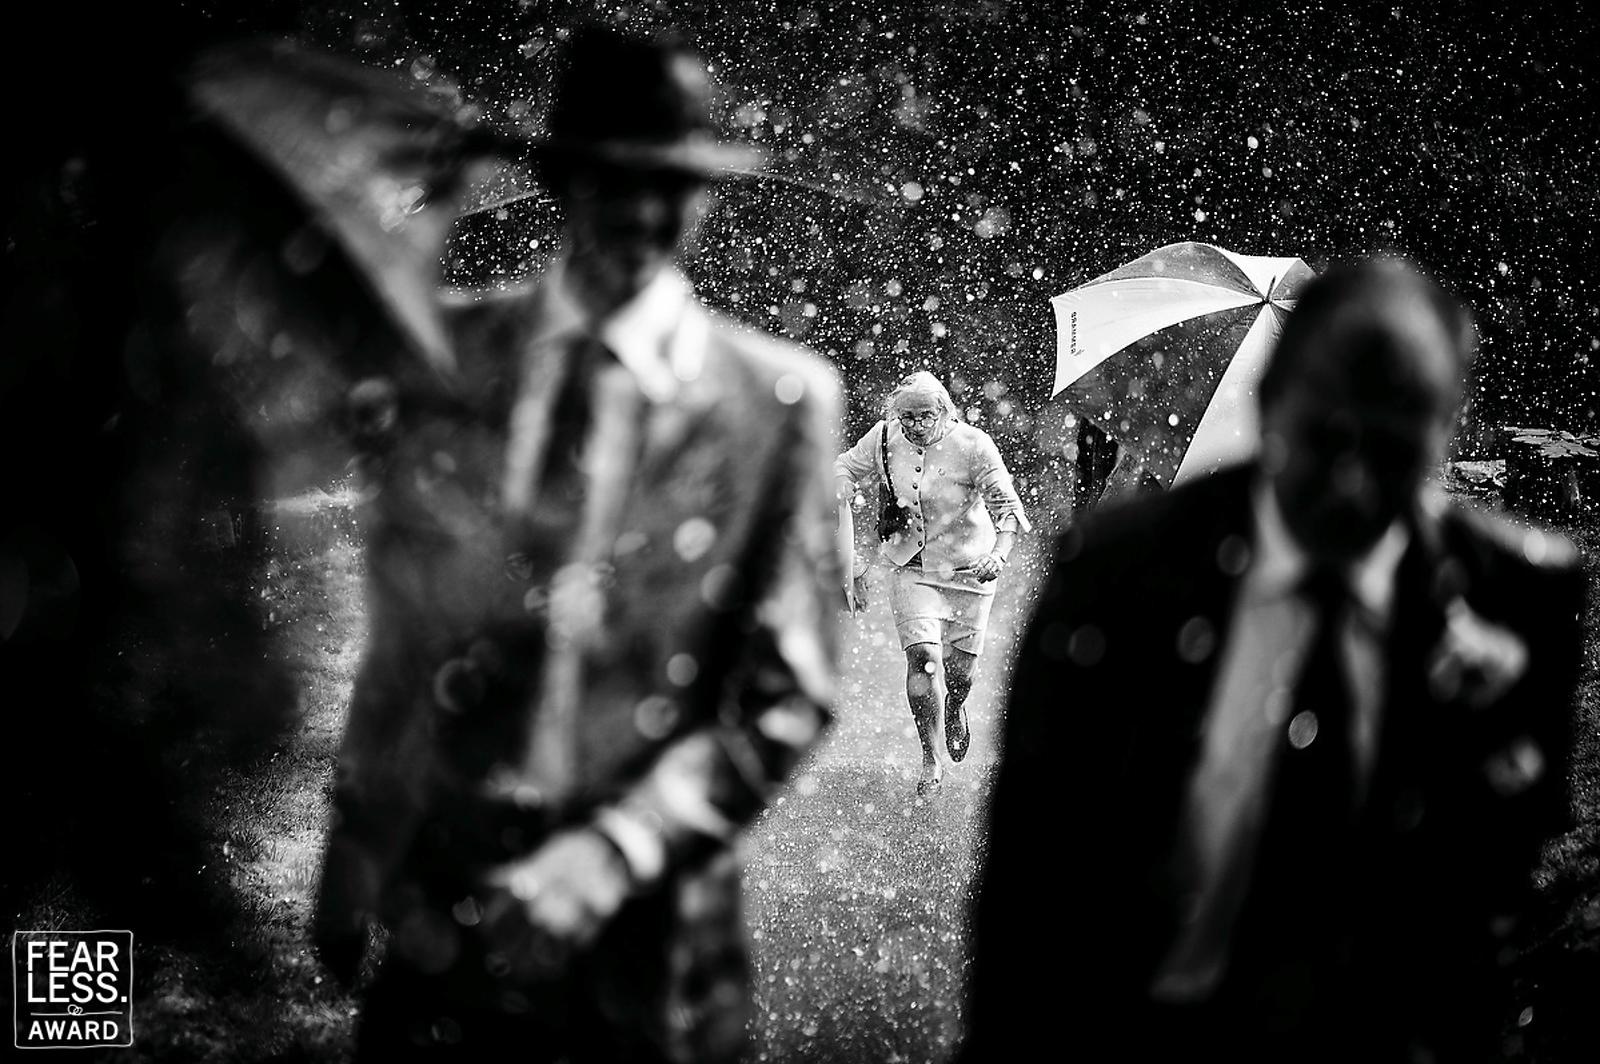 Wet wedding award winning wedding photography